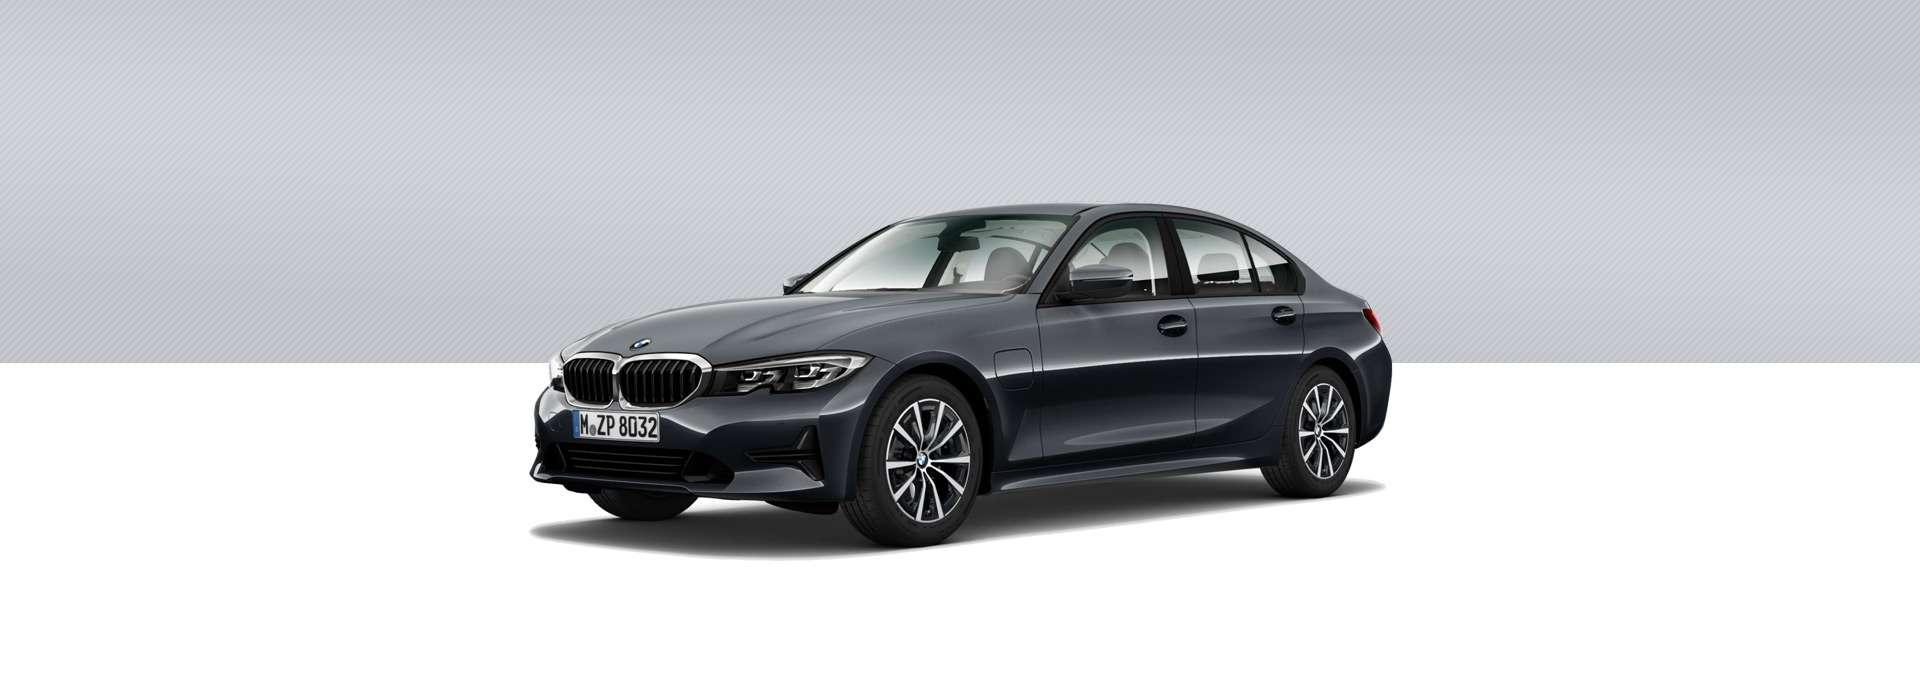 BMW Nuevo Serie 3 Berlina Híbrido Enchufable